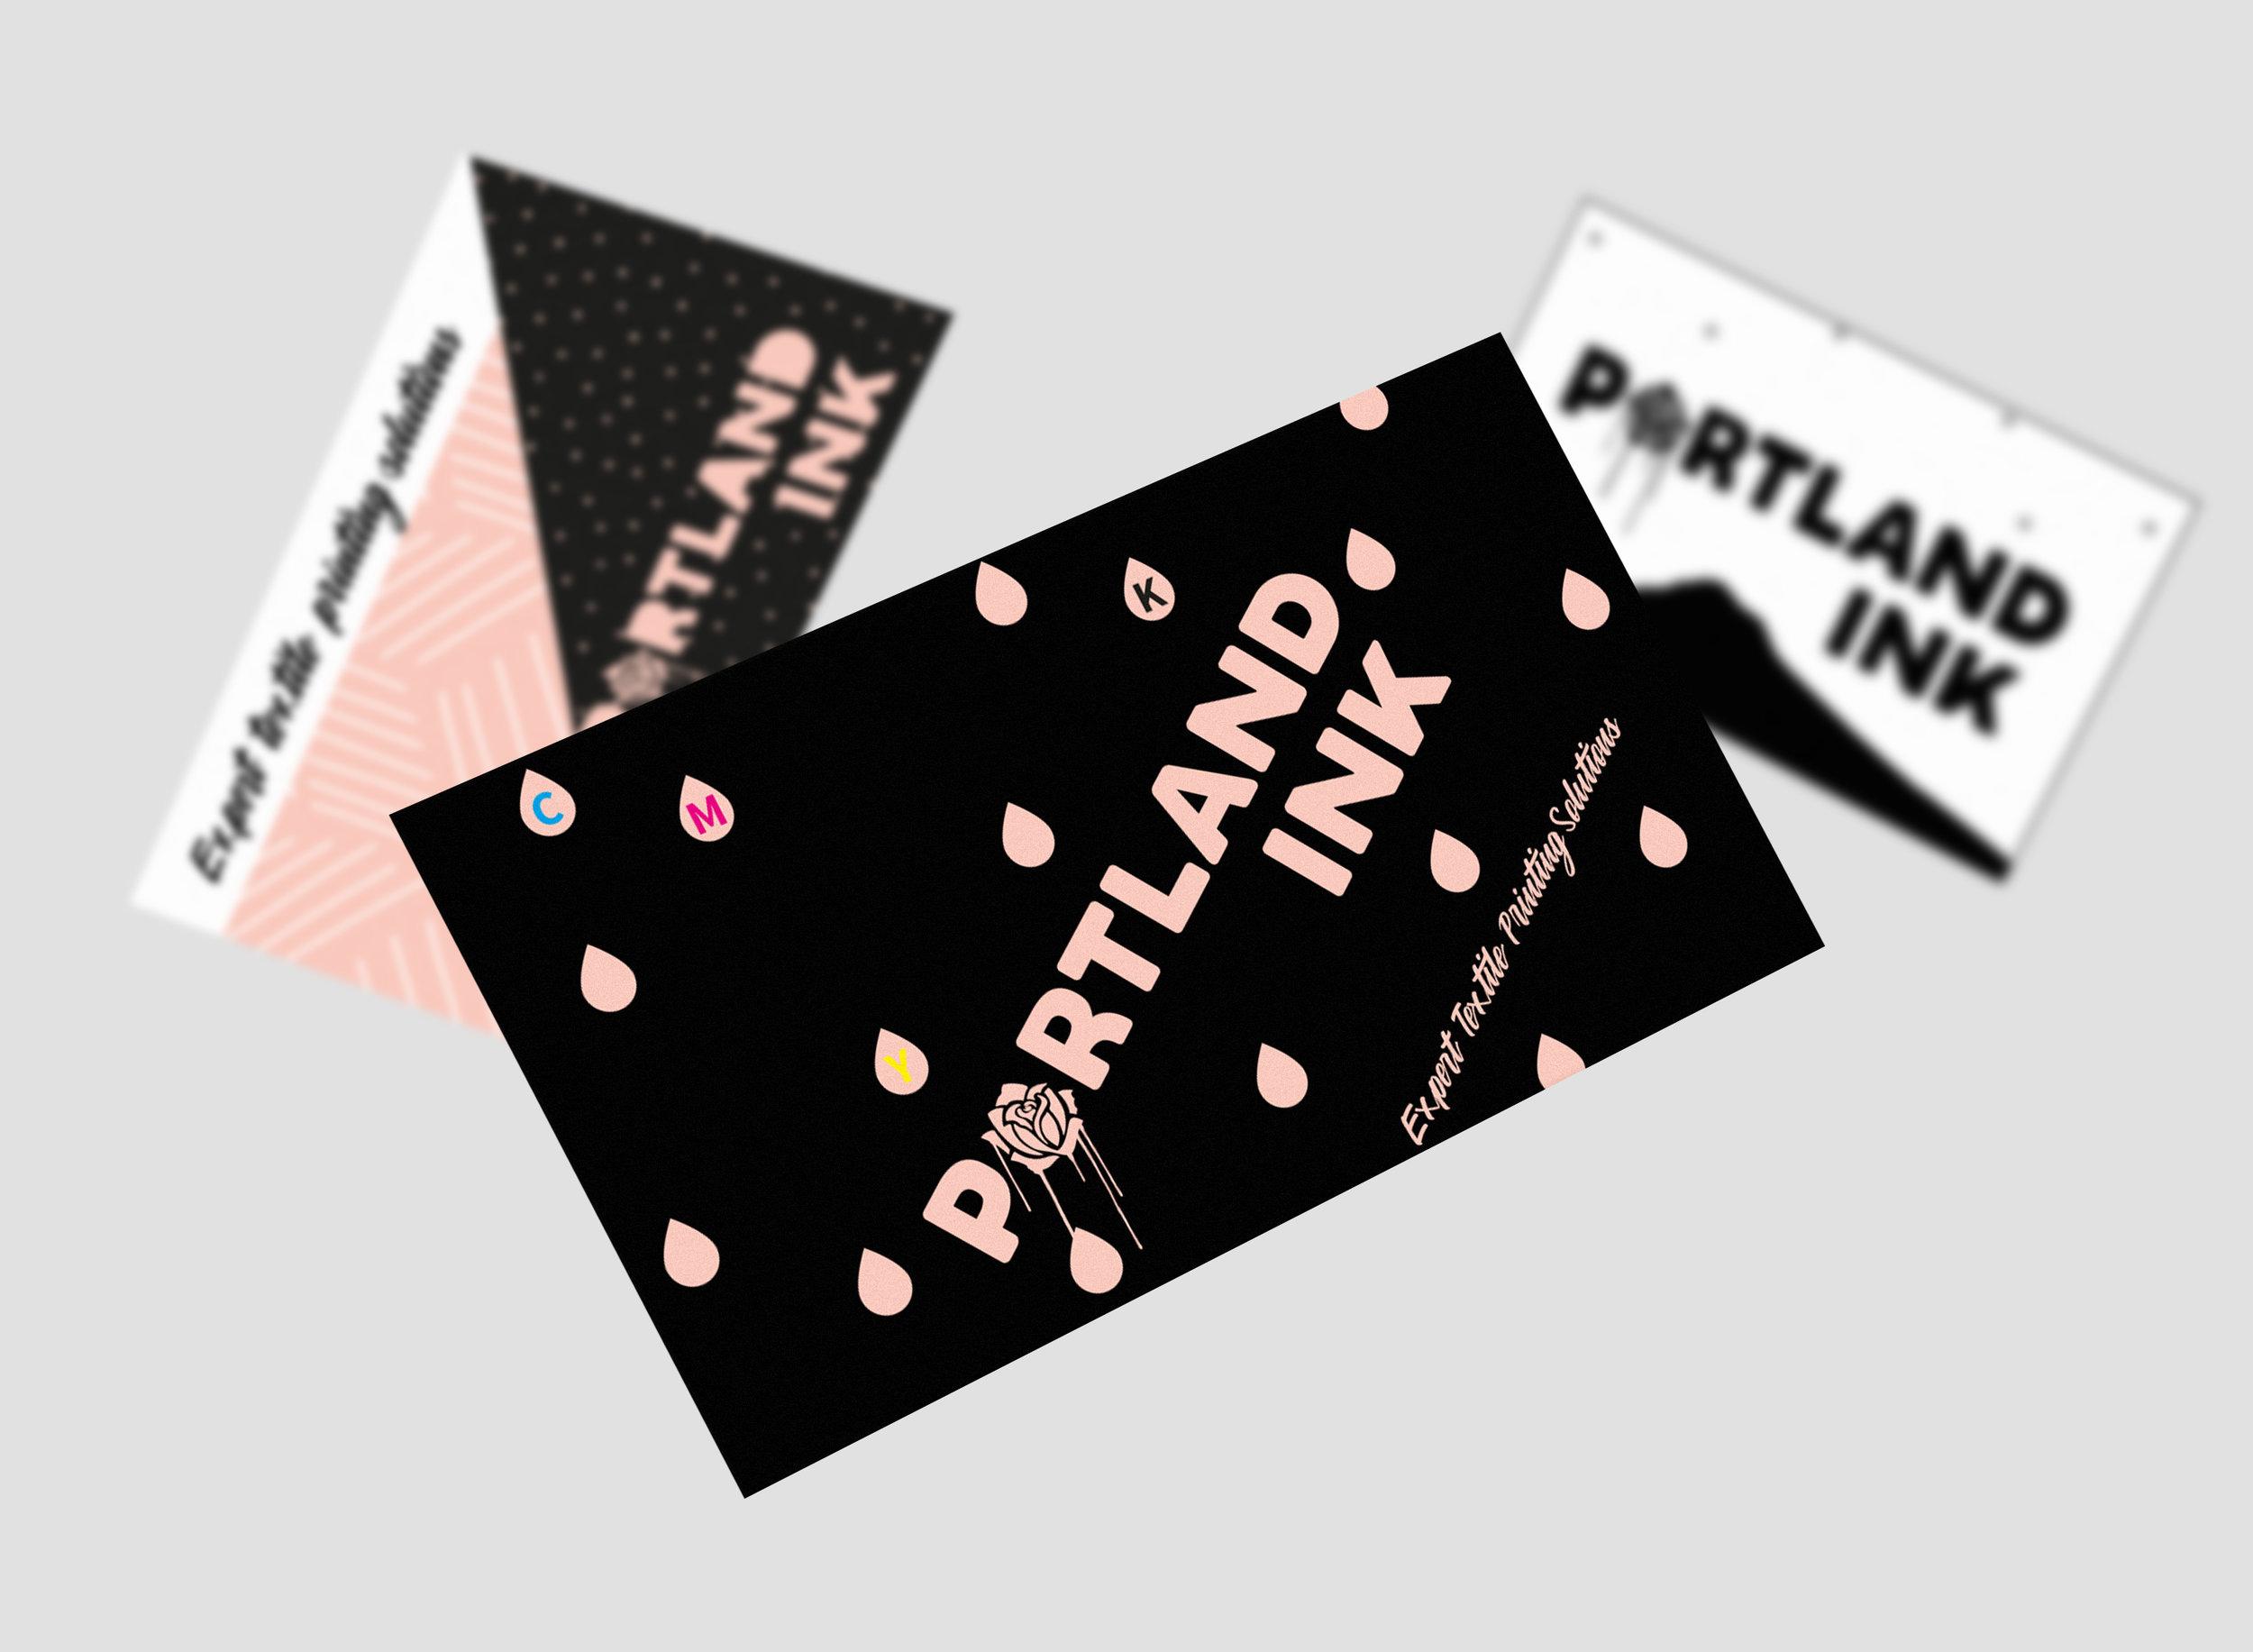 Portland Ink business card design concepts.